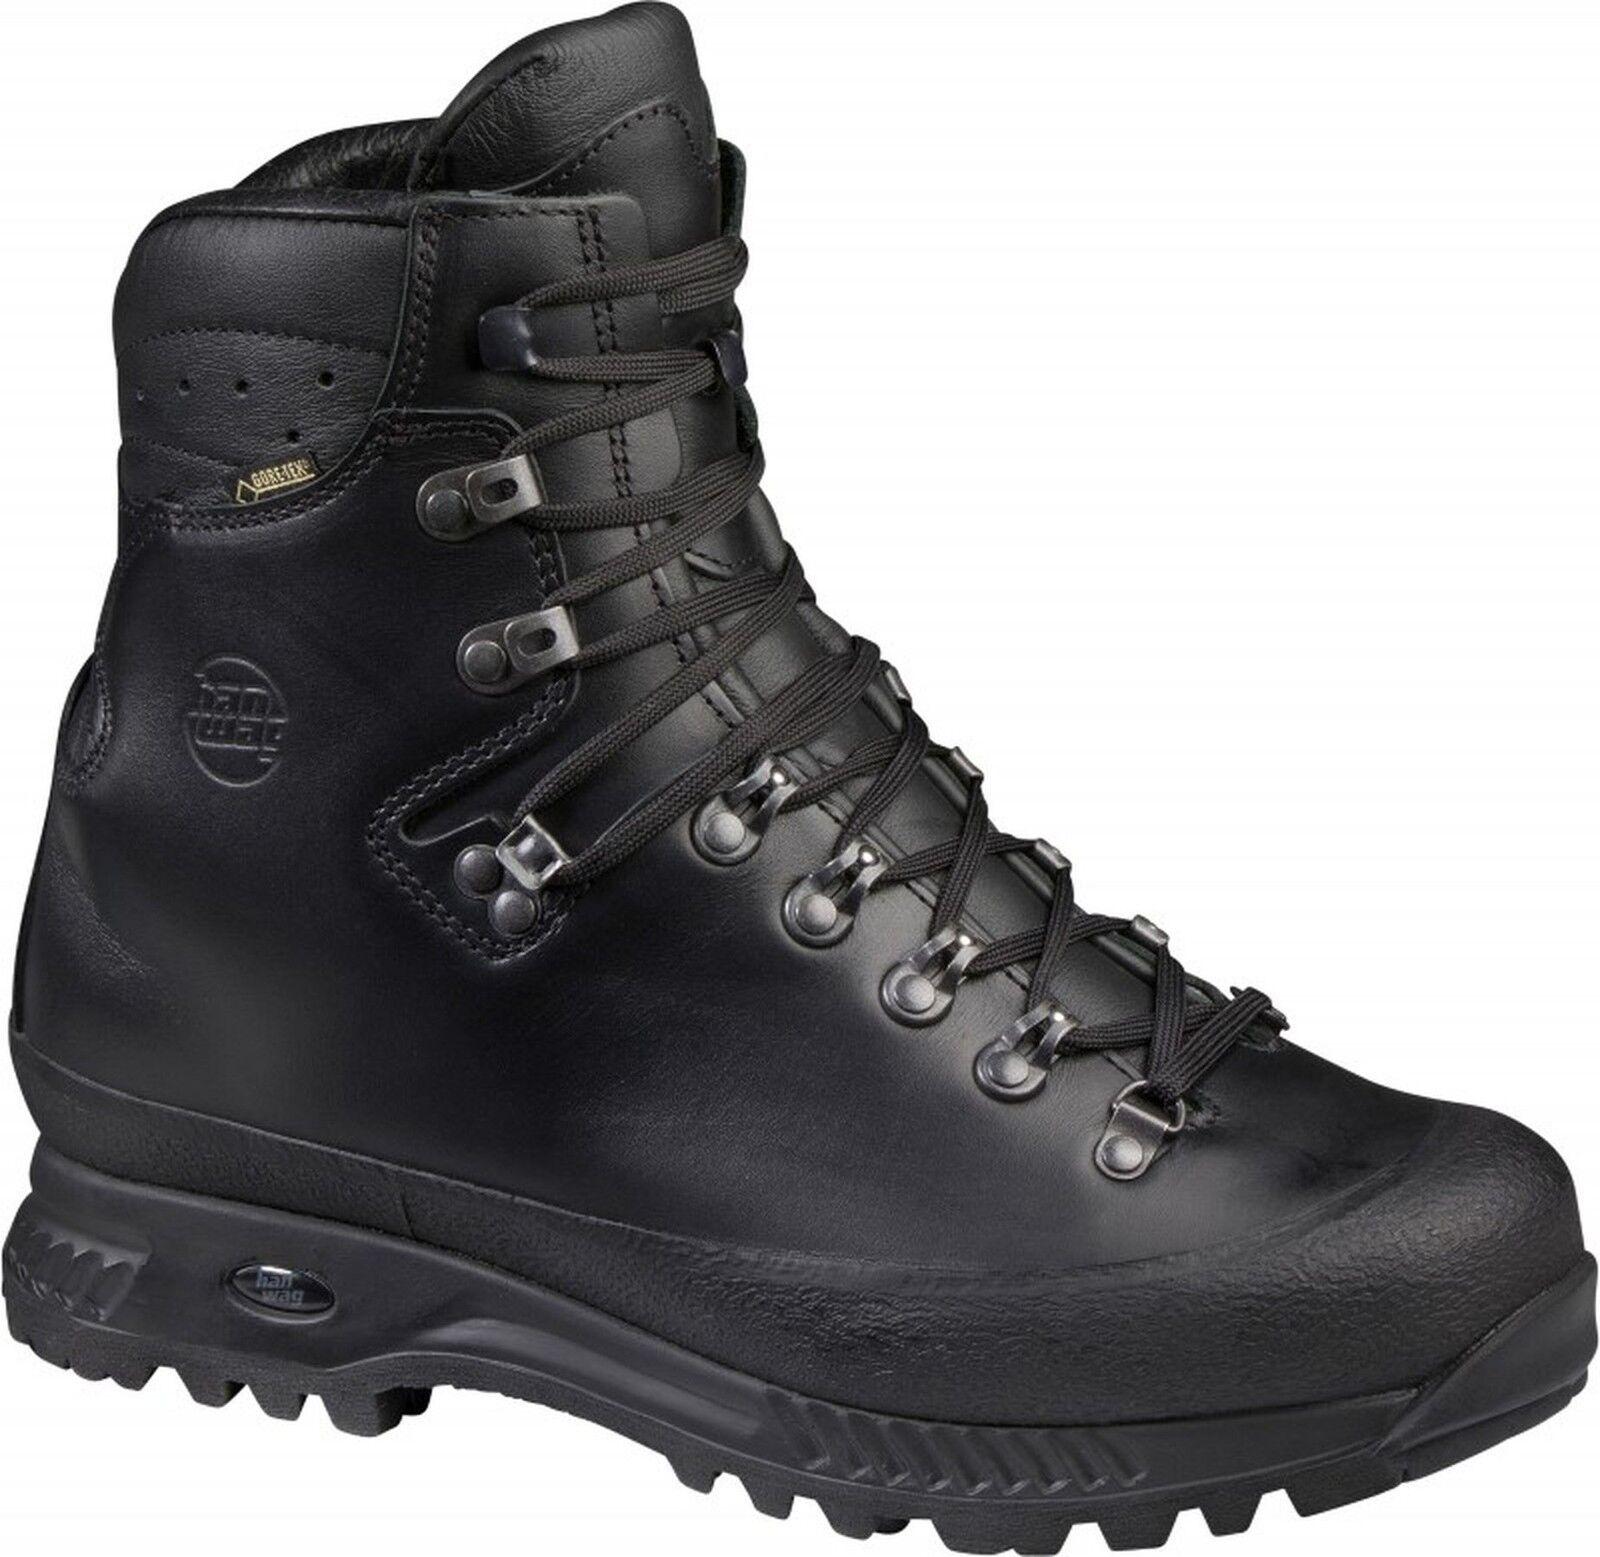 Hanwag  Trekkingstiefel Alaska WIDE GTX breiter Leisten Gr. 13 - 48,5  black  large discount